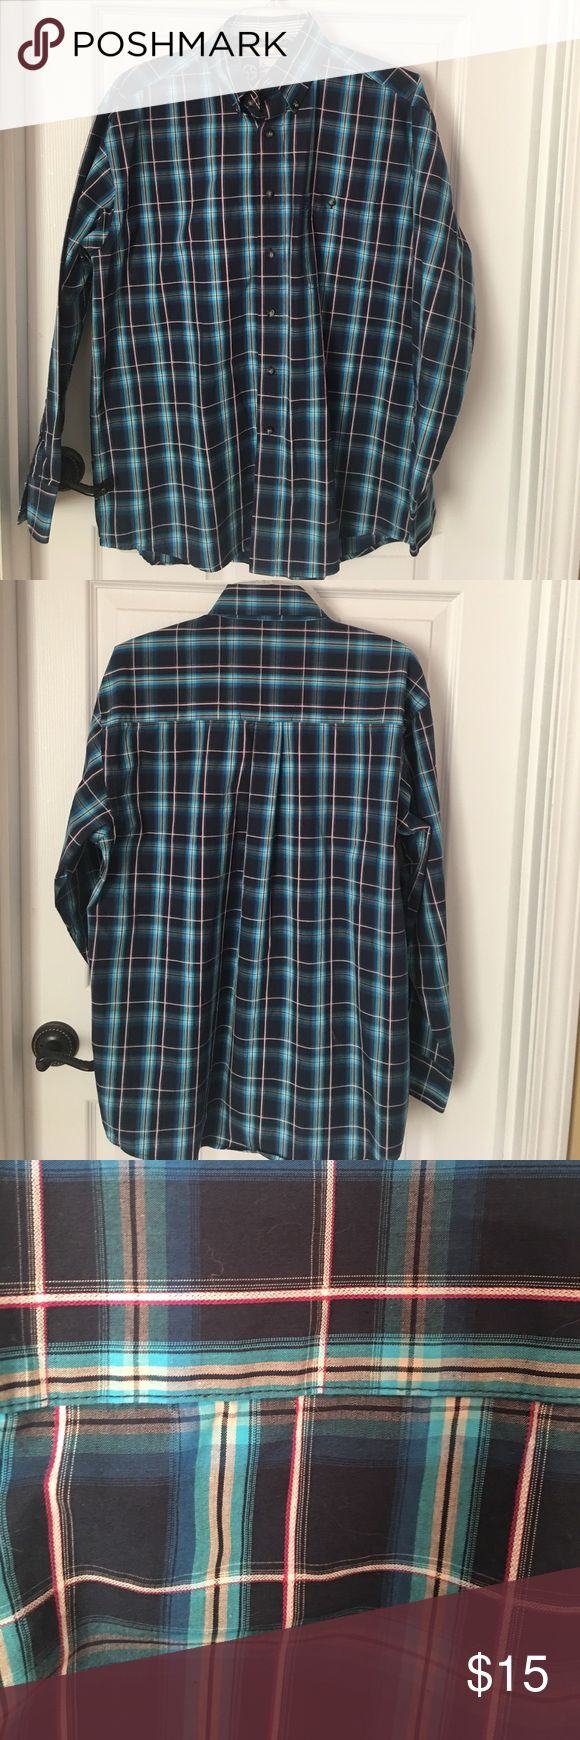 Wrangler shirt George Strait cowboy cut shirt. Excellent condition. Wrangler Shirts